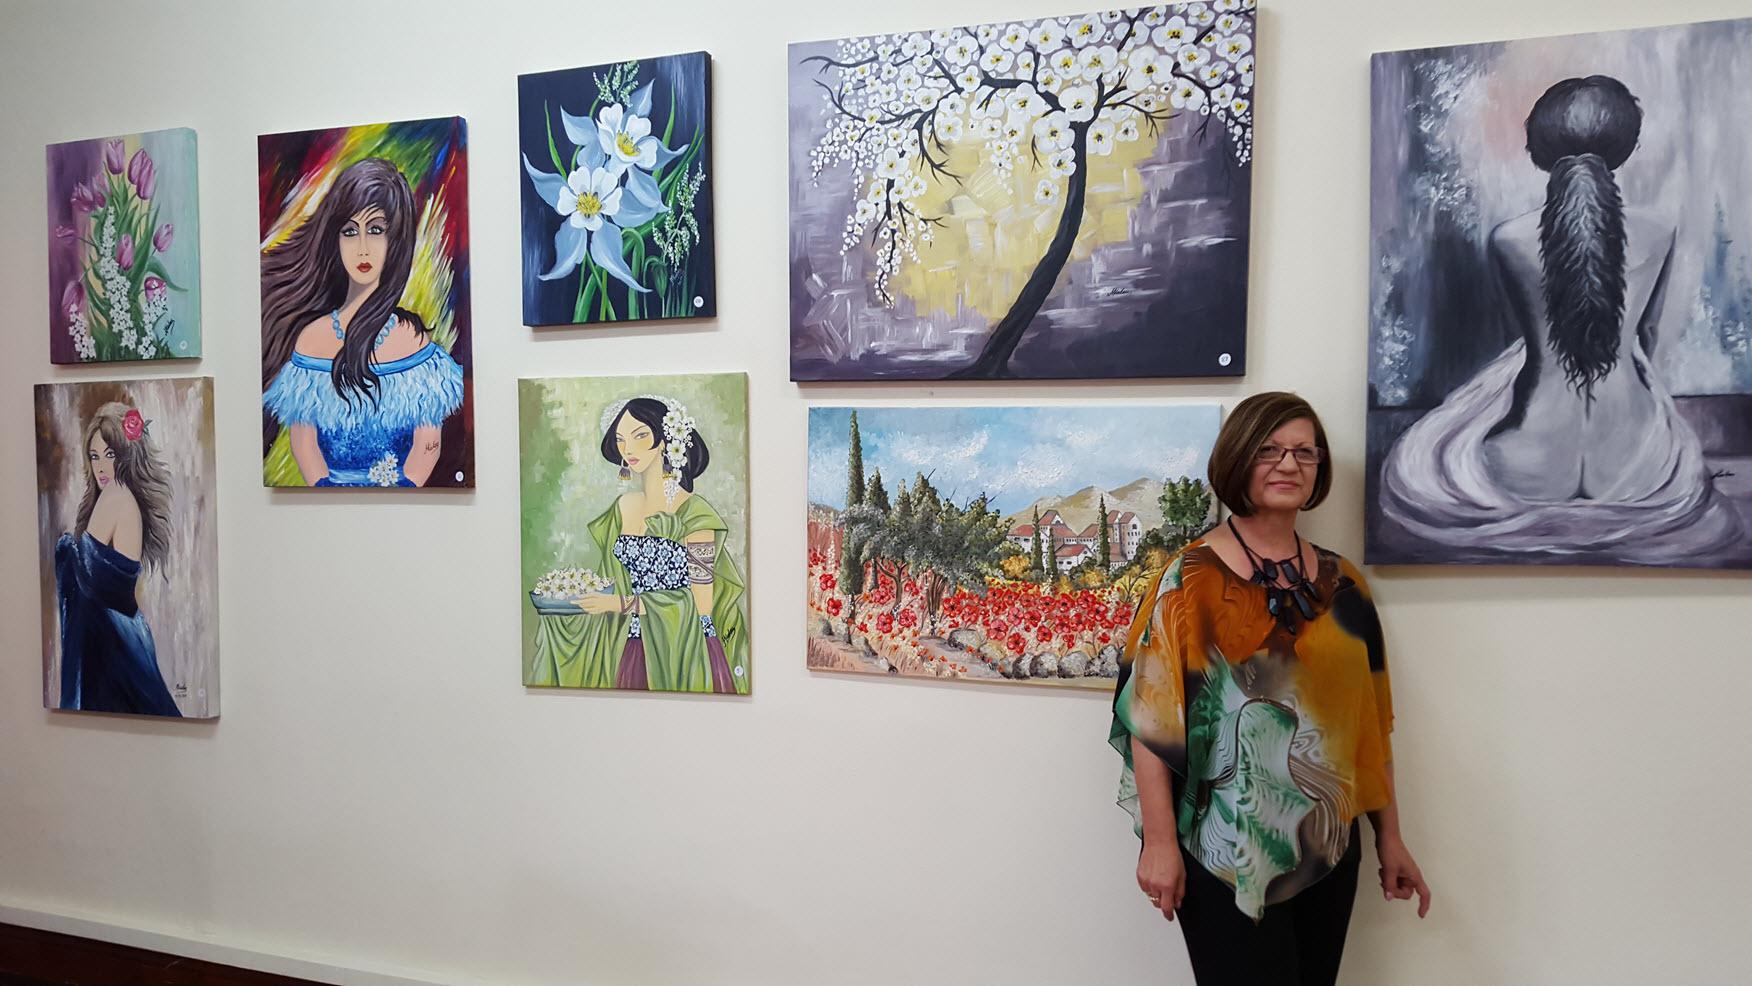 Artist Mary Kalaitzis among her wonderful creations